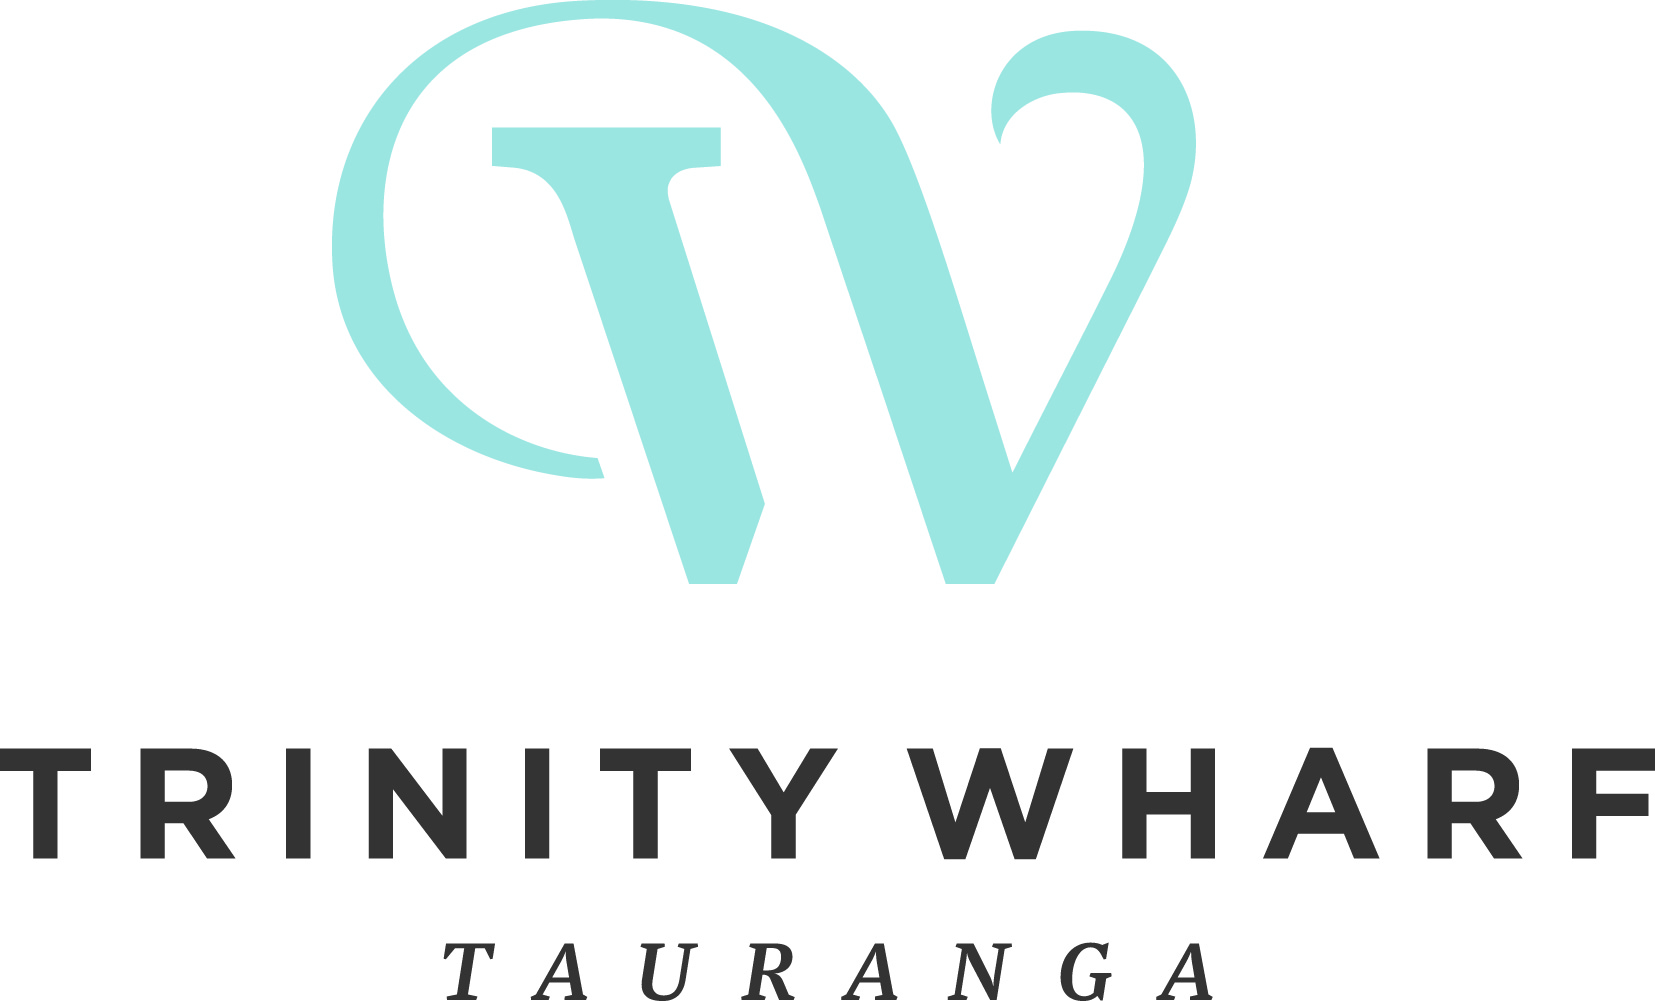 Tarnished-Frocks-and-divas-Trinity-Wharf-Master-logo-CMYK.jpg